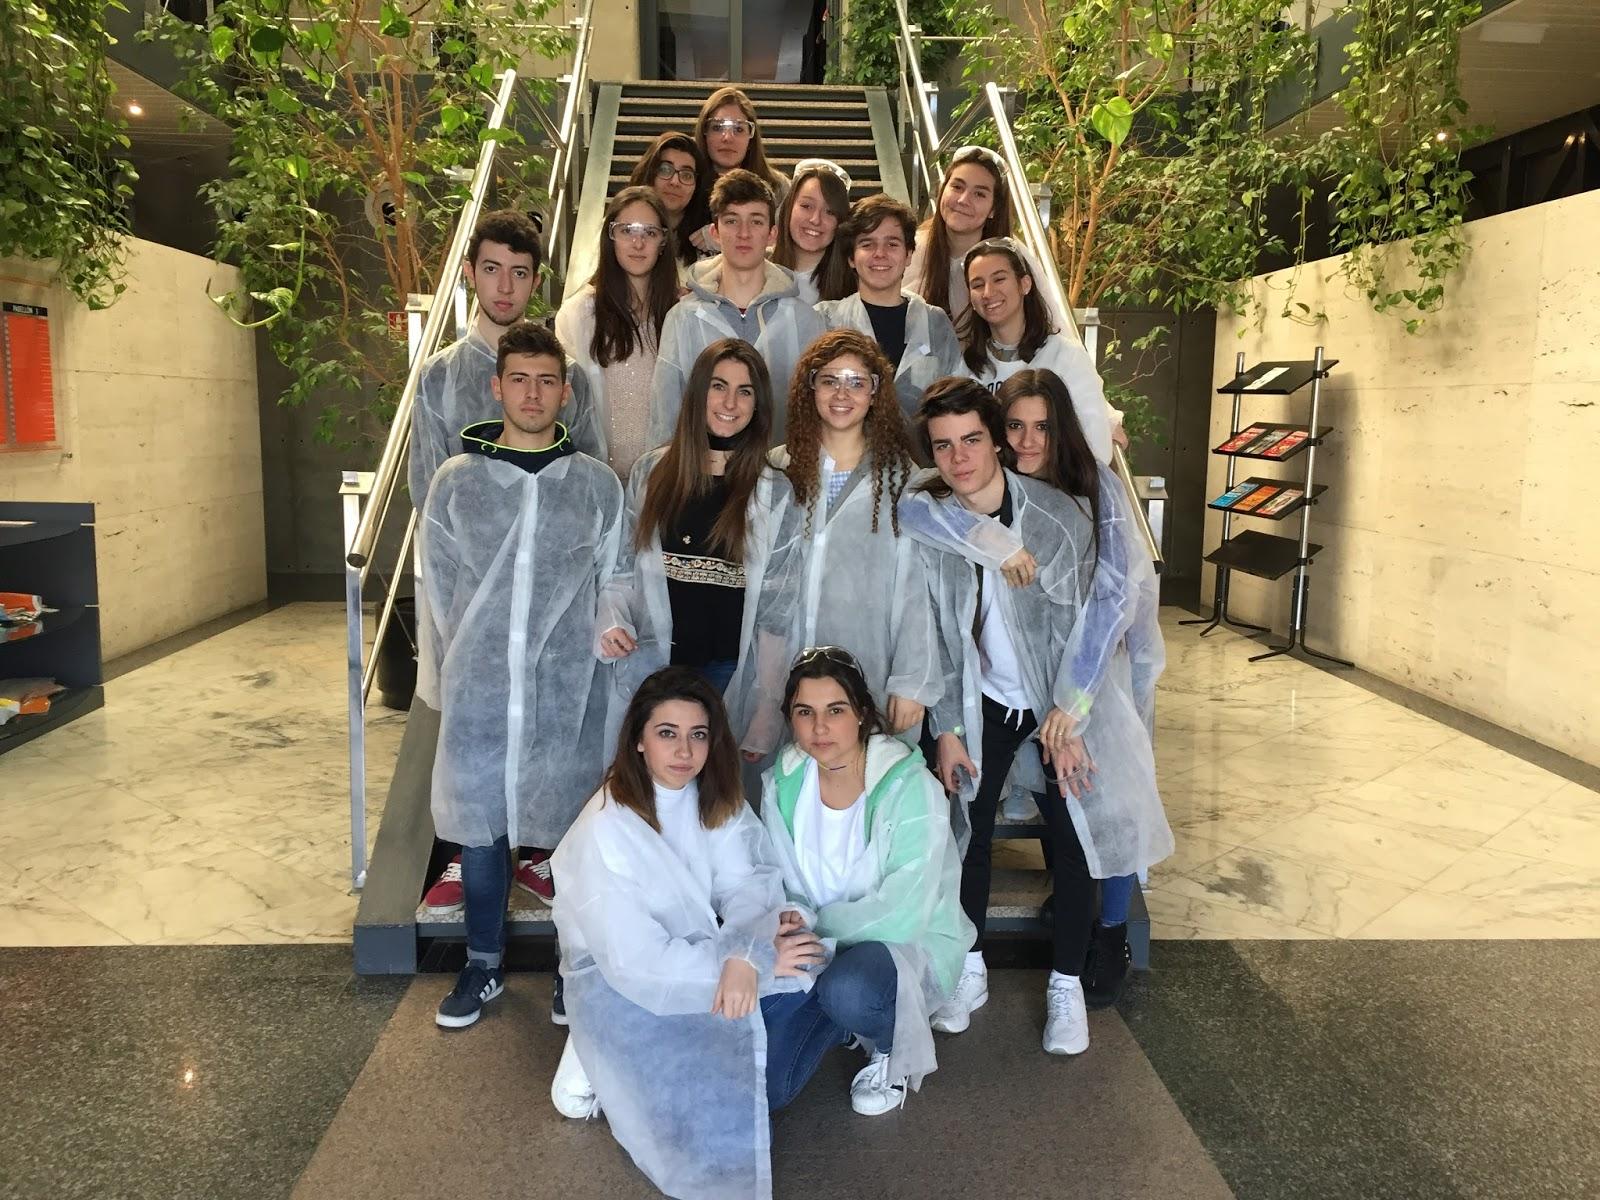 Agustinas Valladolid - 2017 - Bachillerato 2 - Visita Crystal Pharma 2